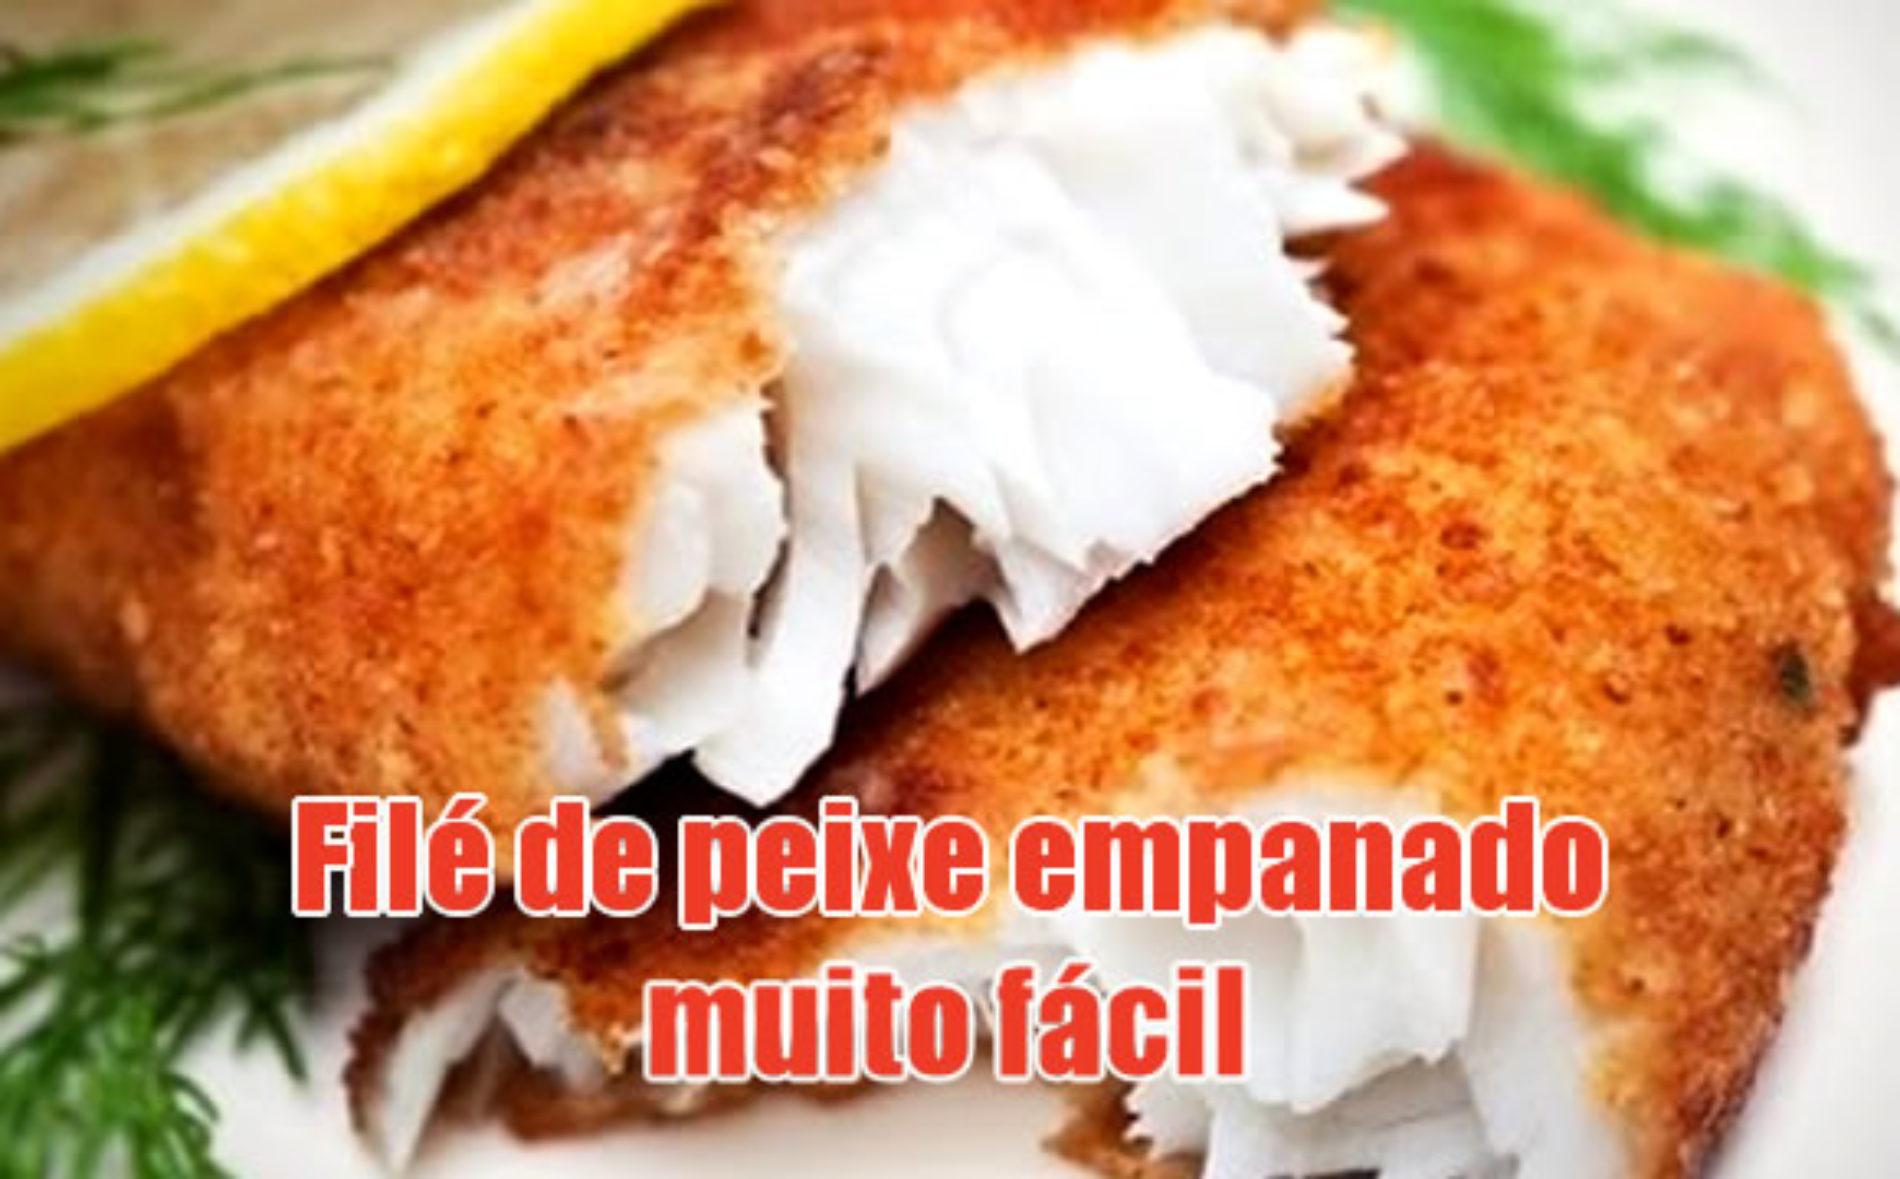 Filé de peixe empanado FIT e Dukan